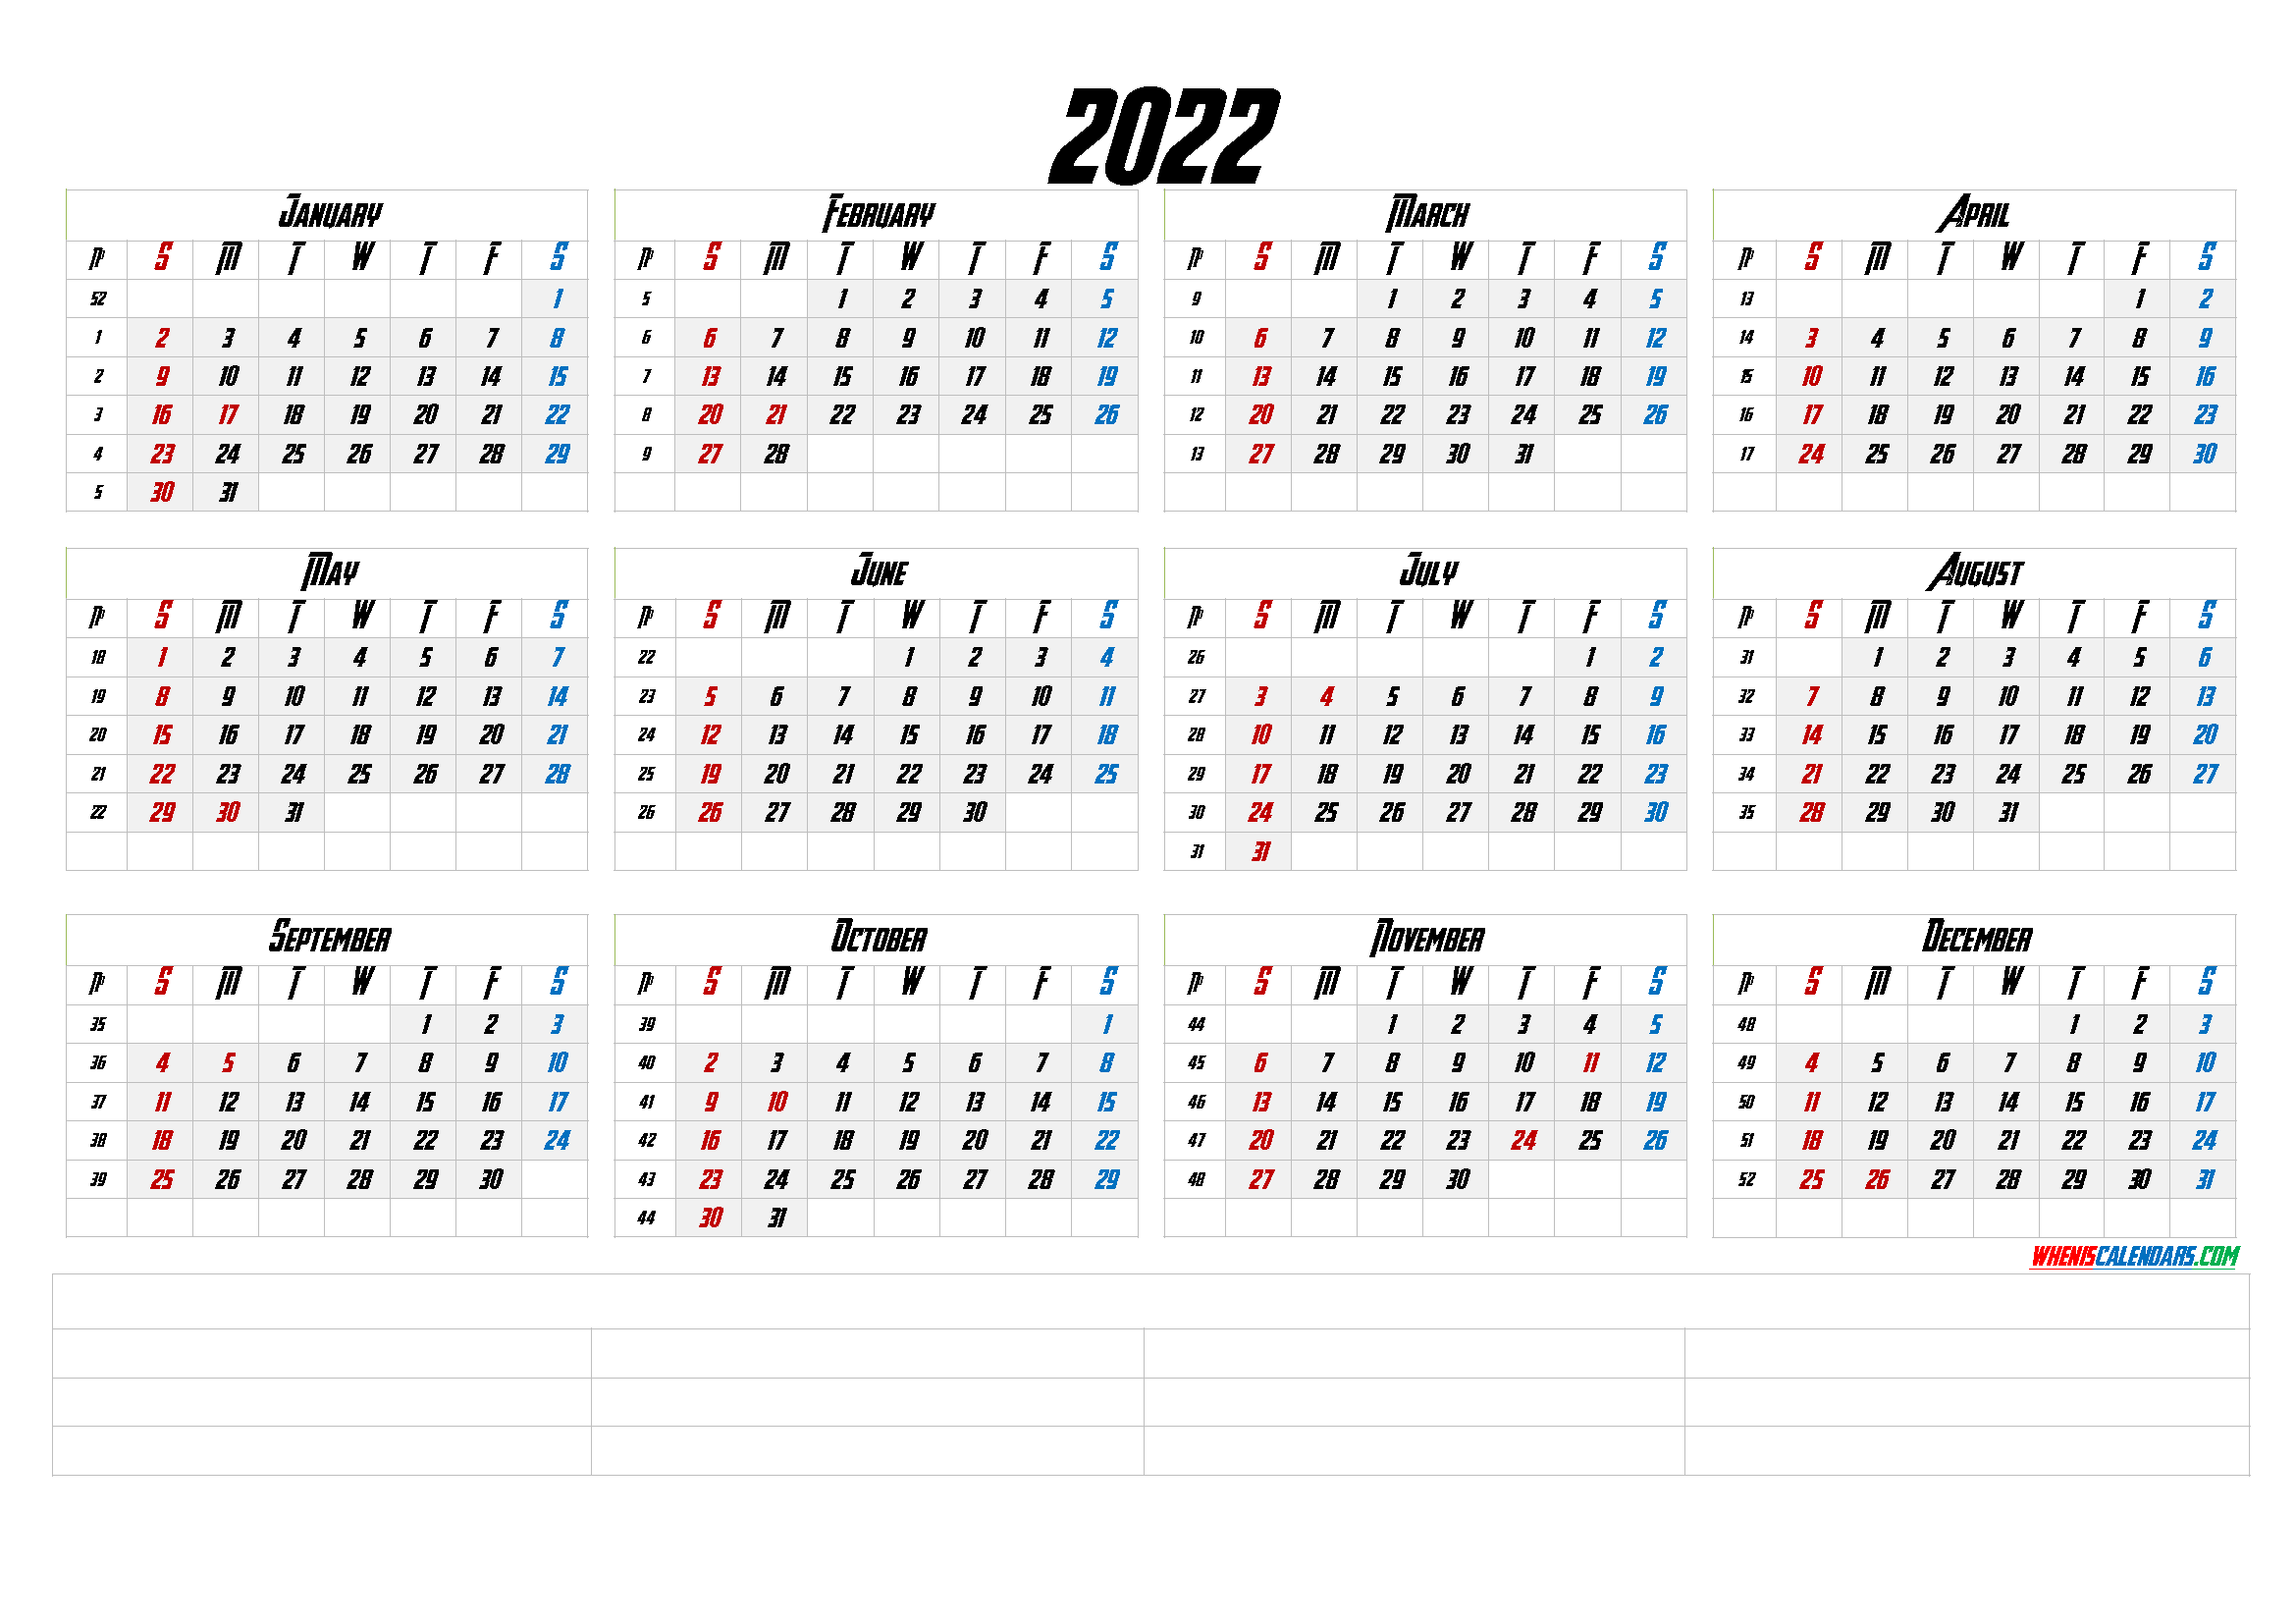 12 Month Calendar Printable 2022 (6 Templates) - Free ...